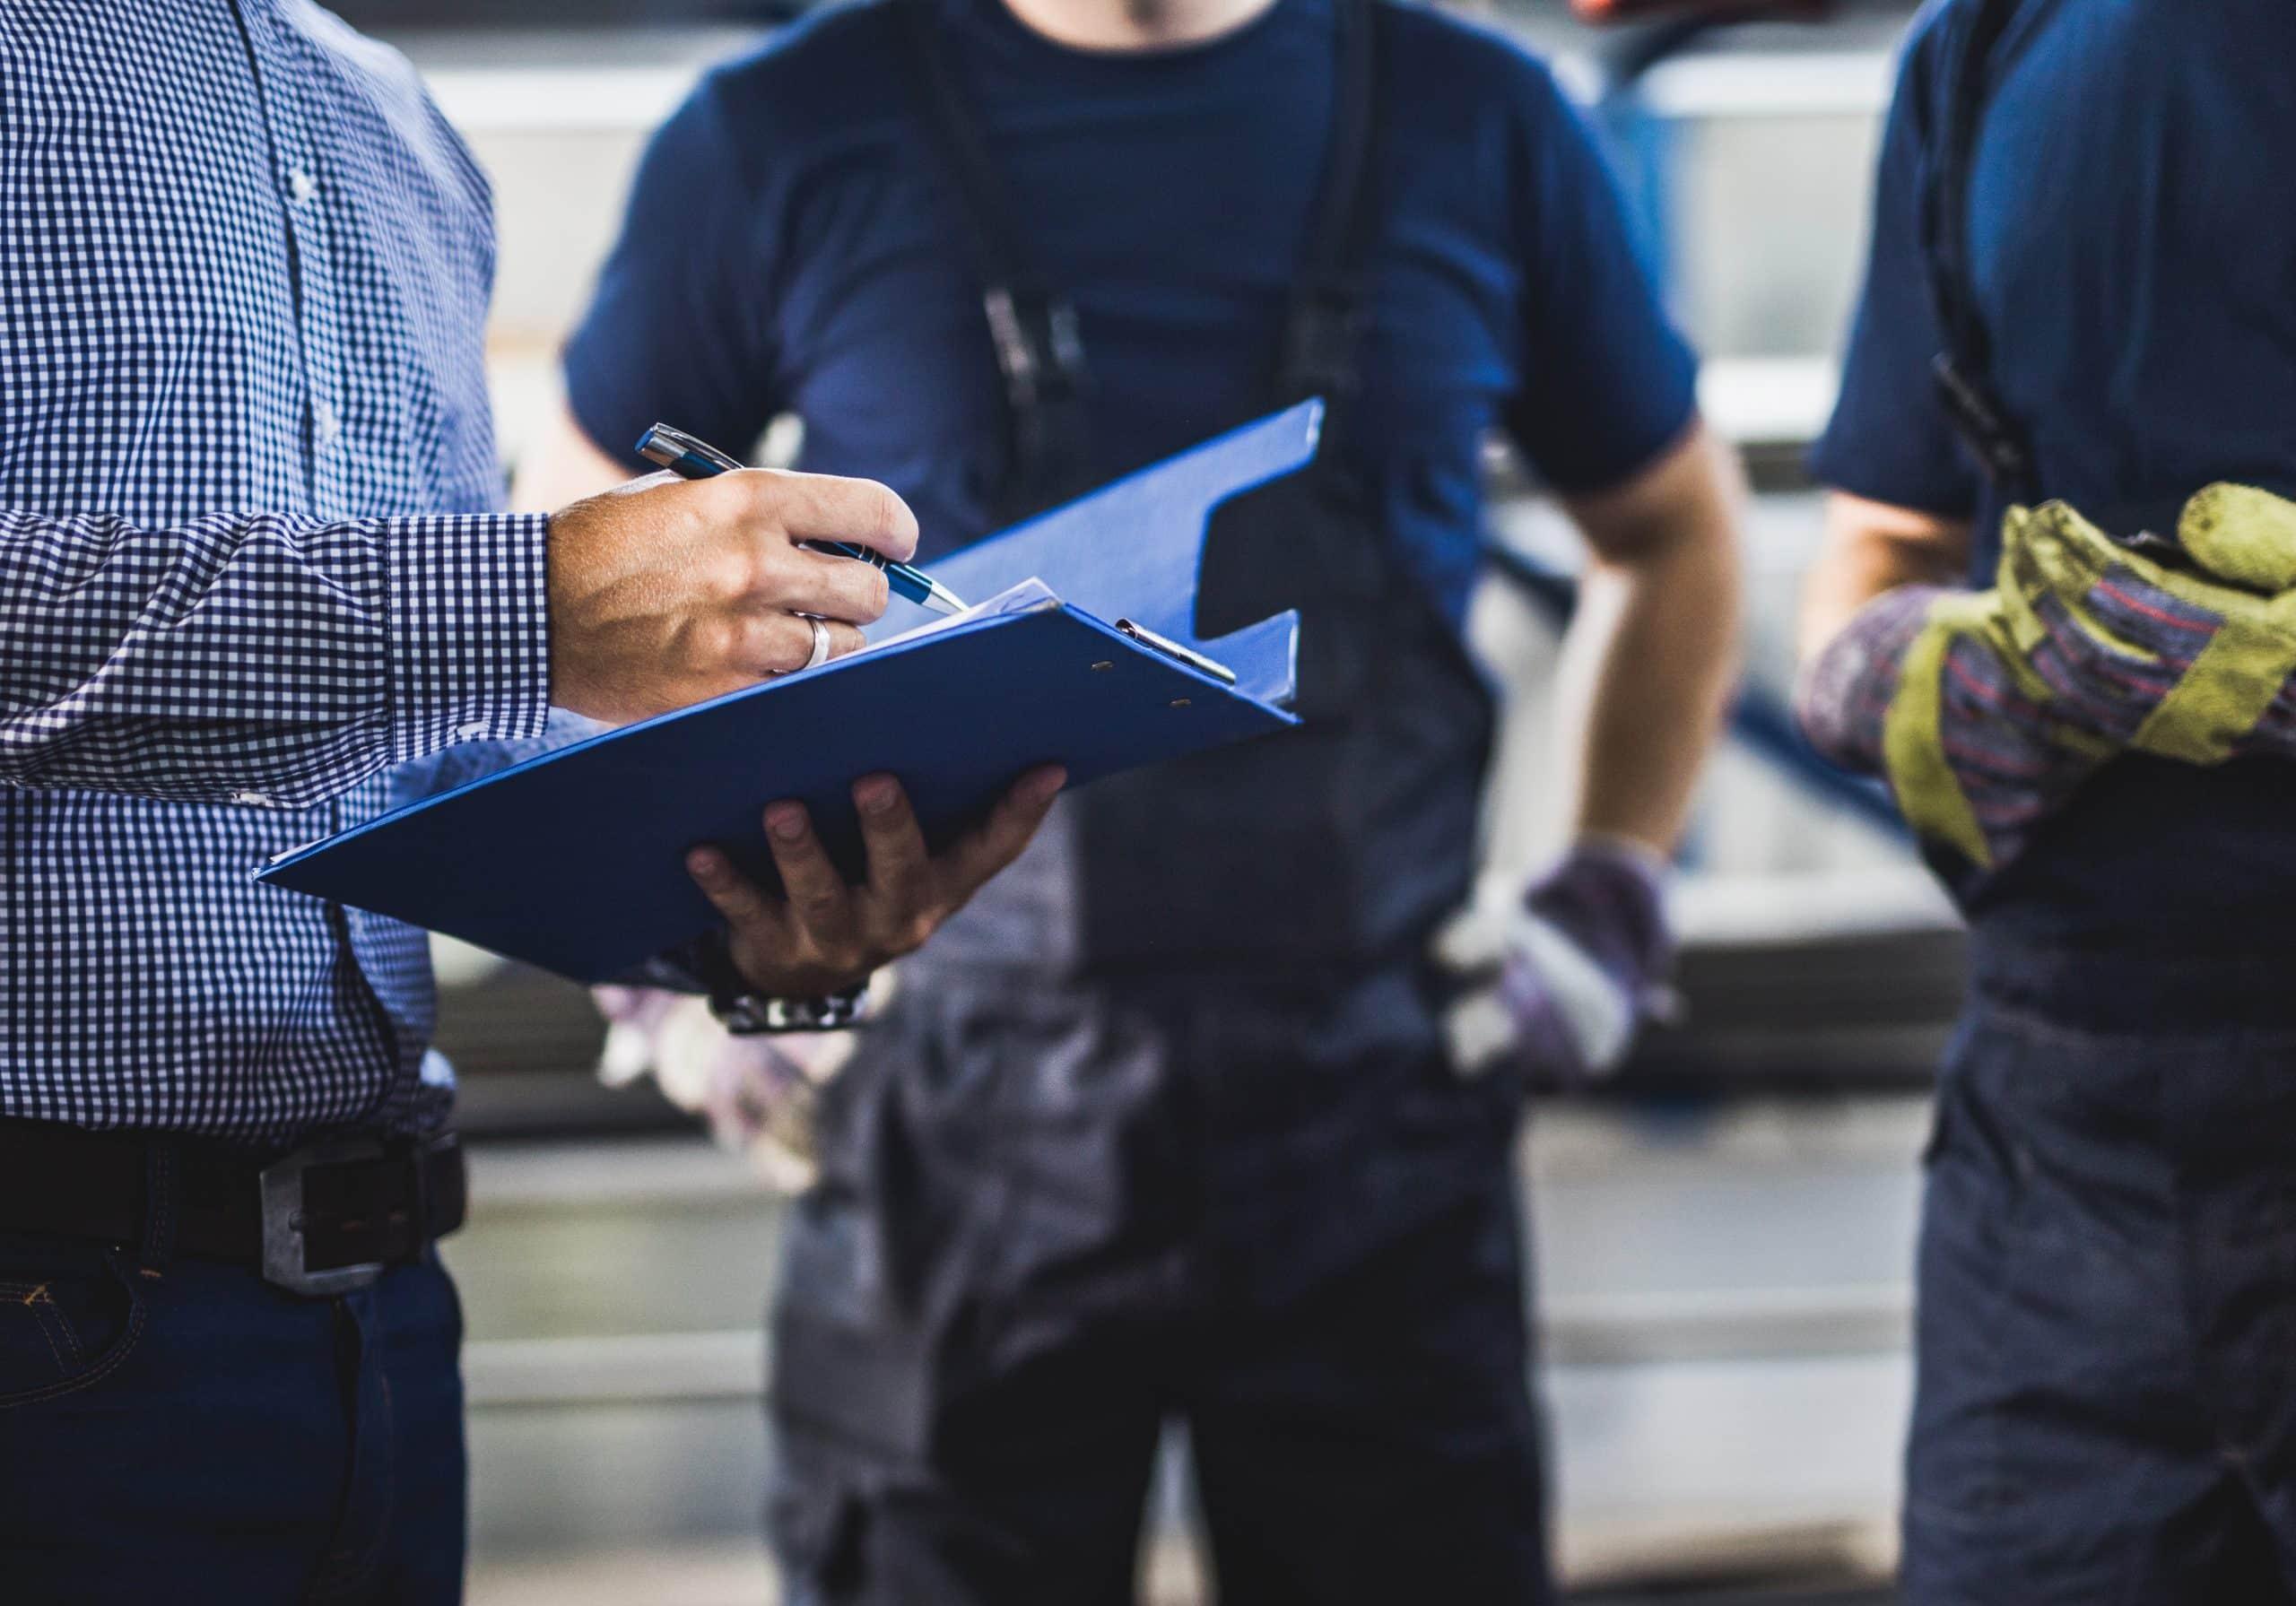 worker notifying employer of workplace injury